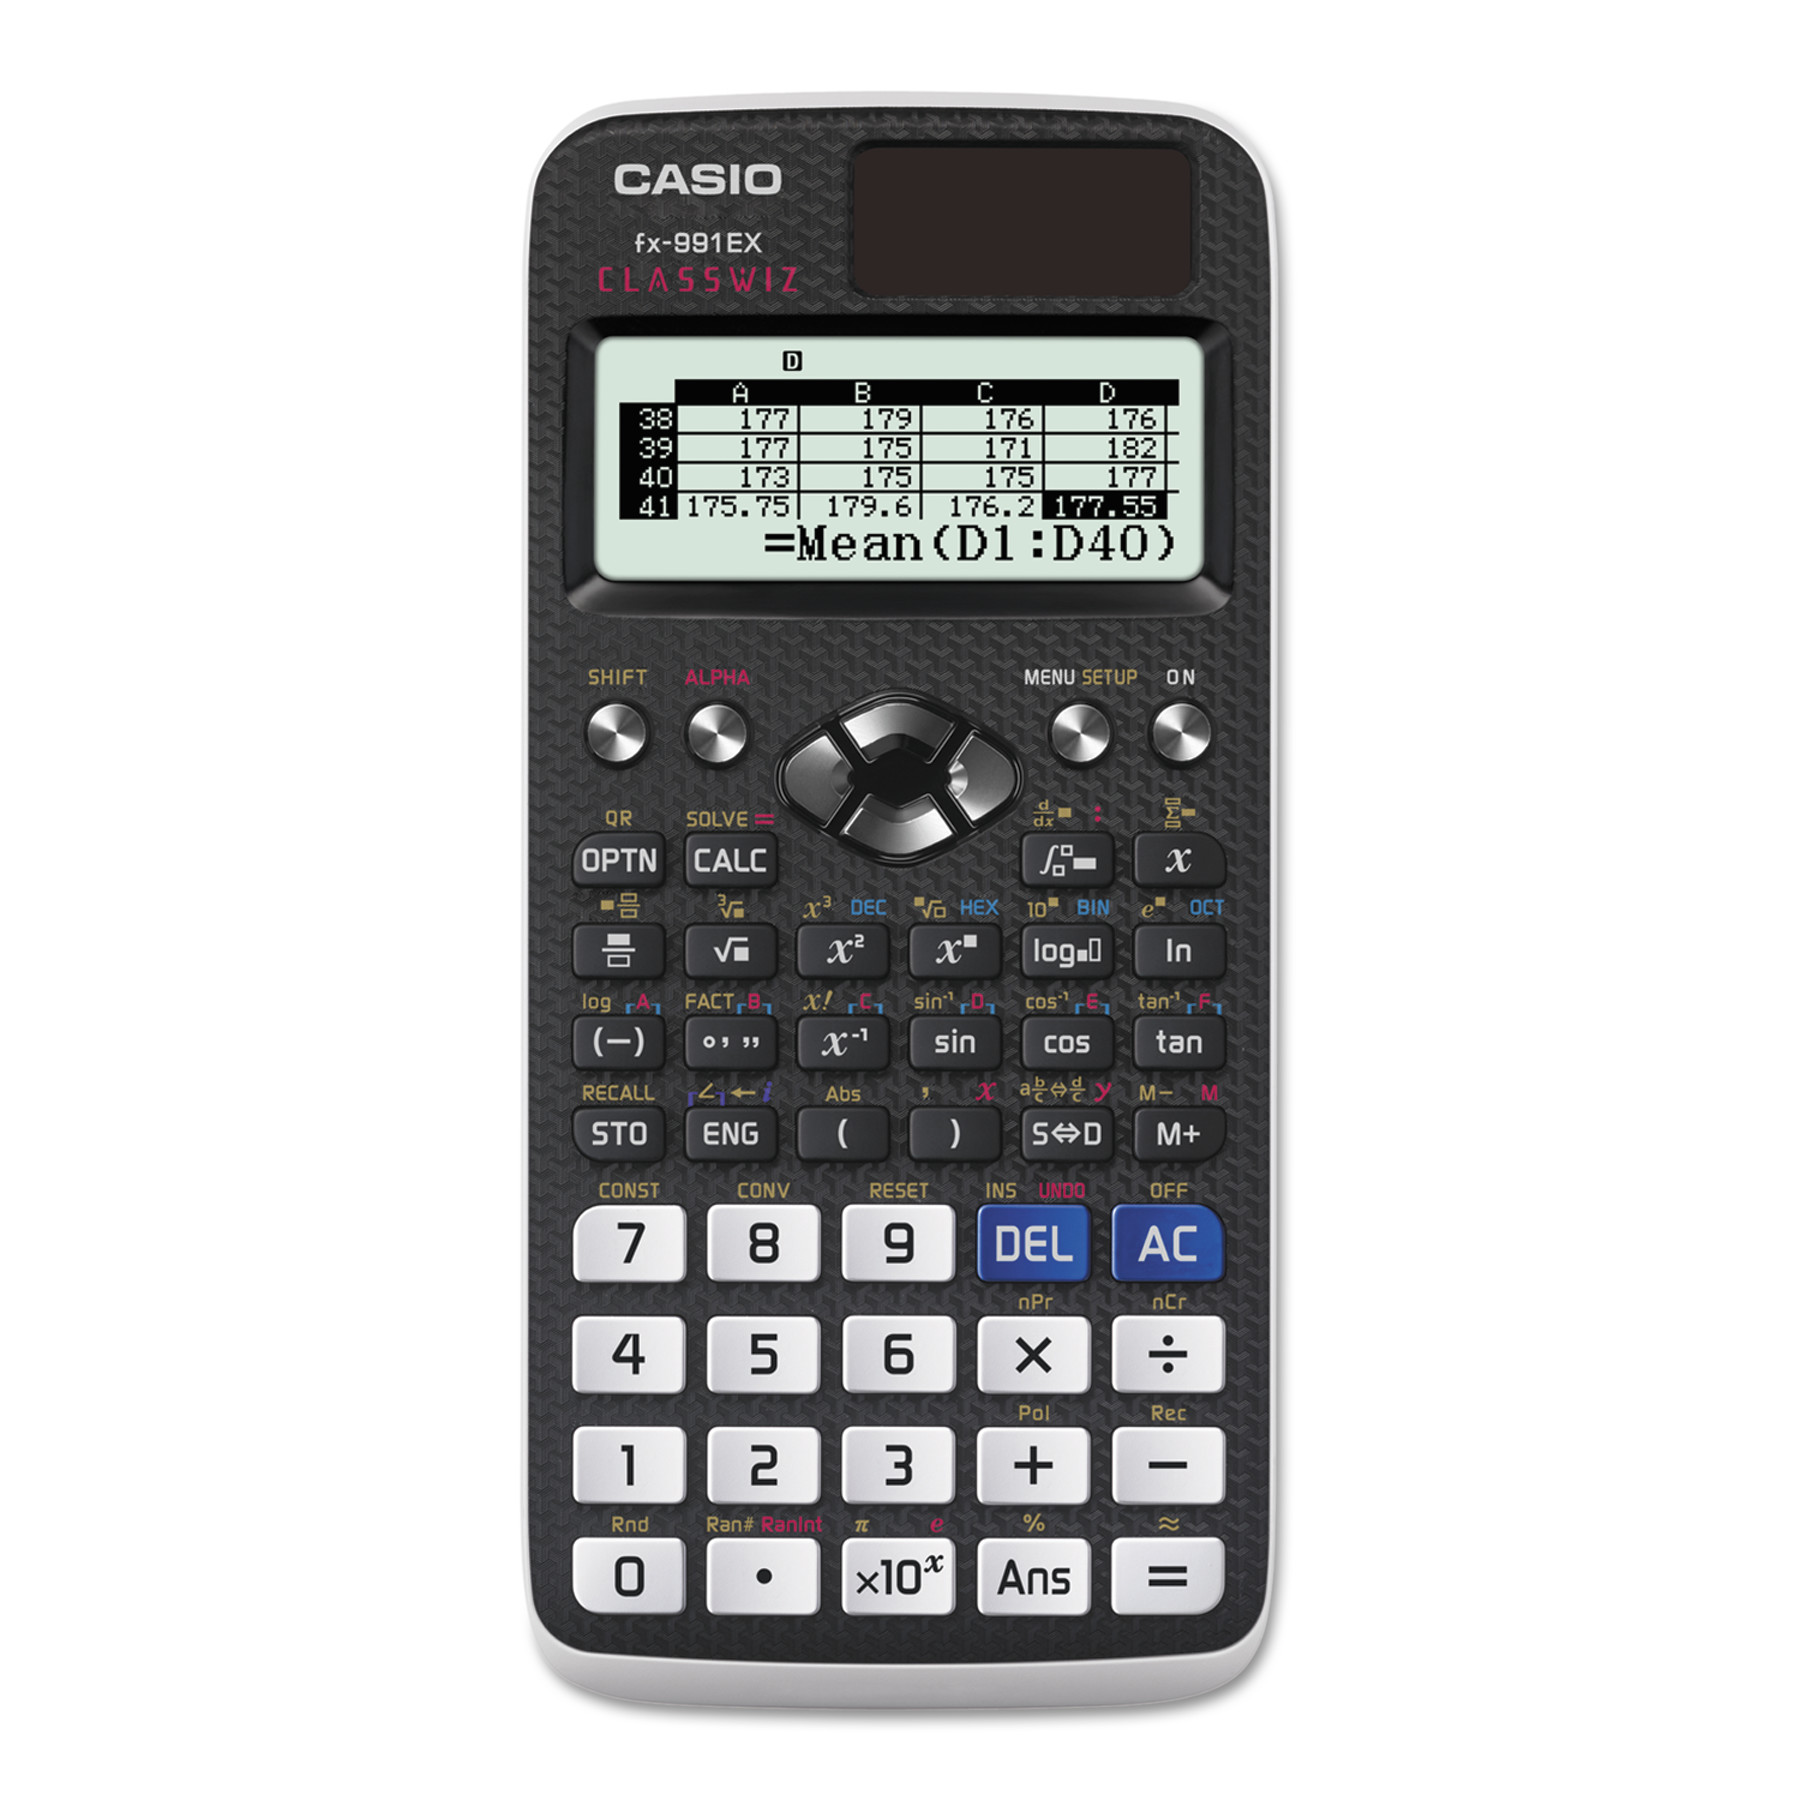 Casio FX-991EX Advanced Scientific Calculator, High Resolution LCD Screen